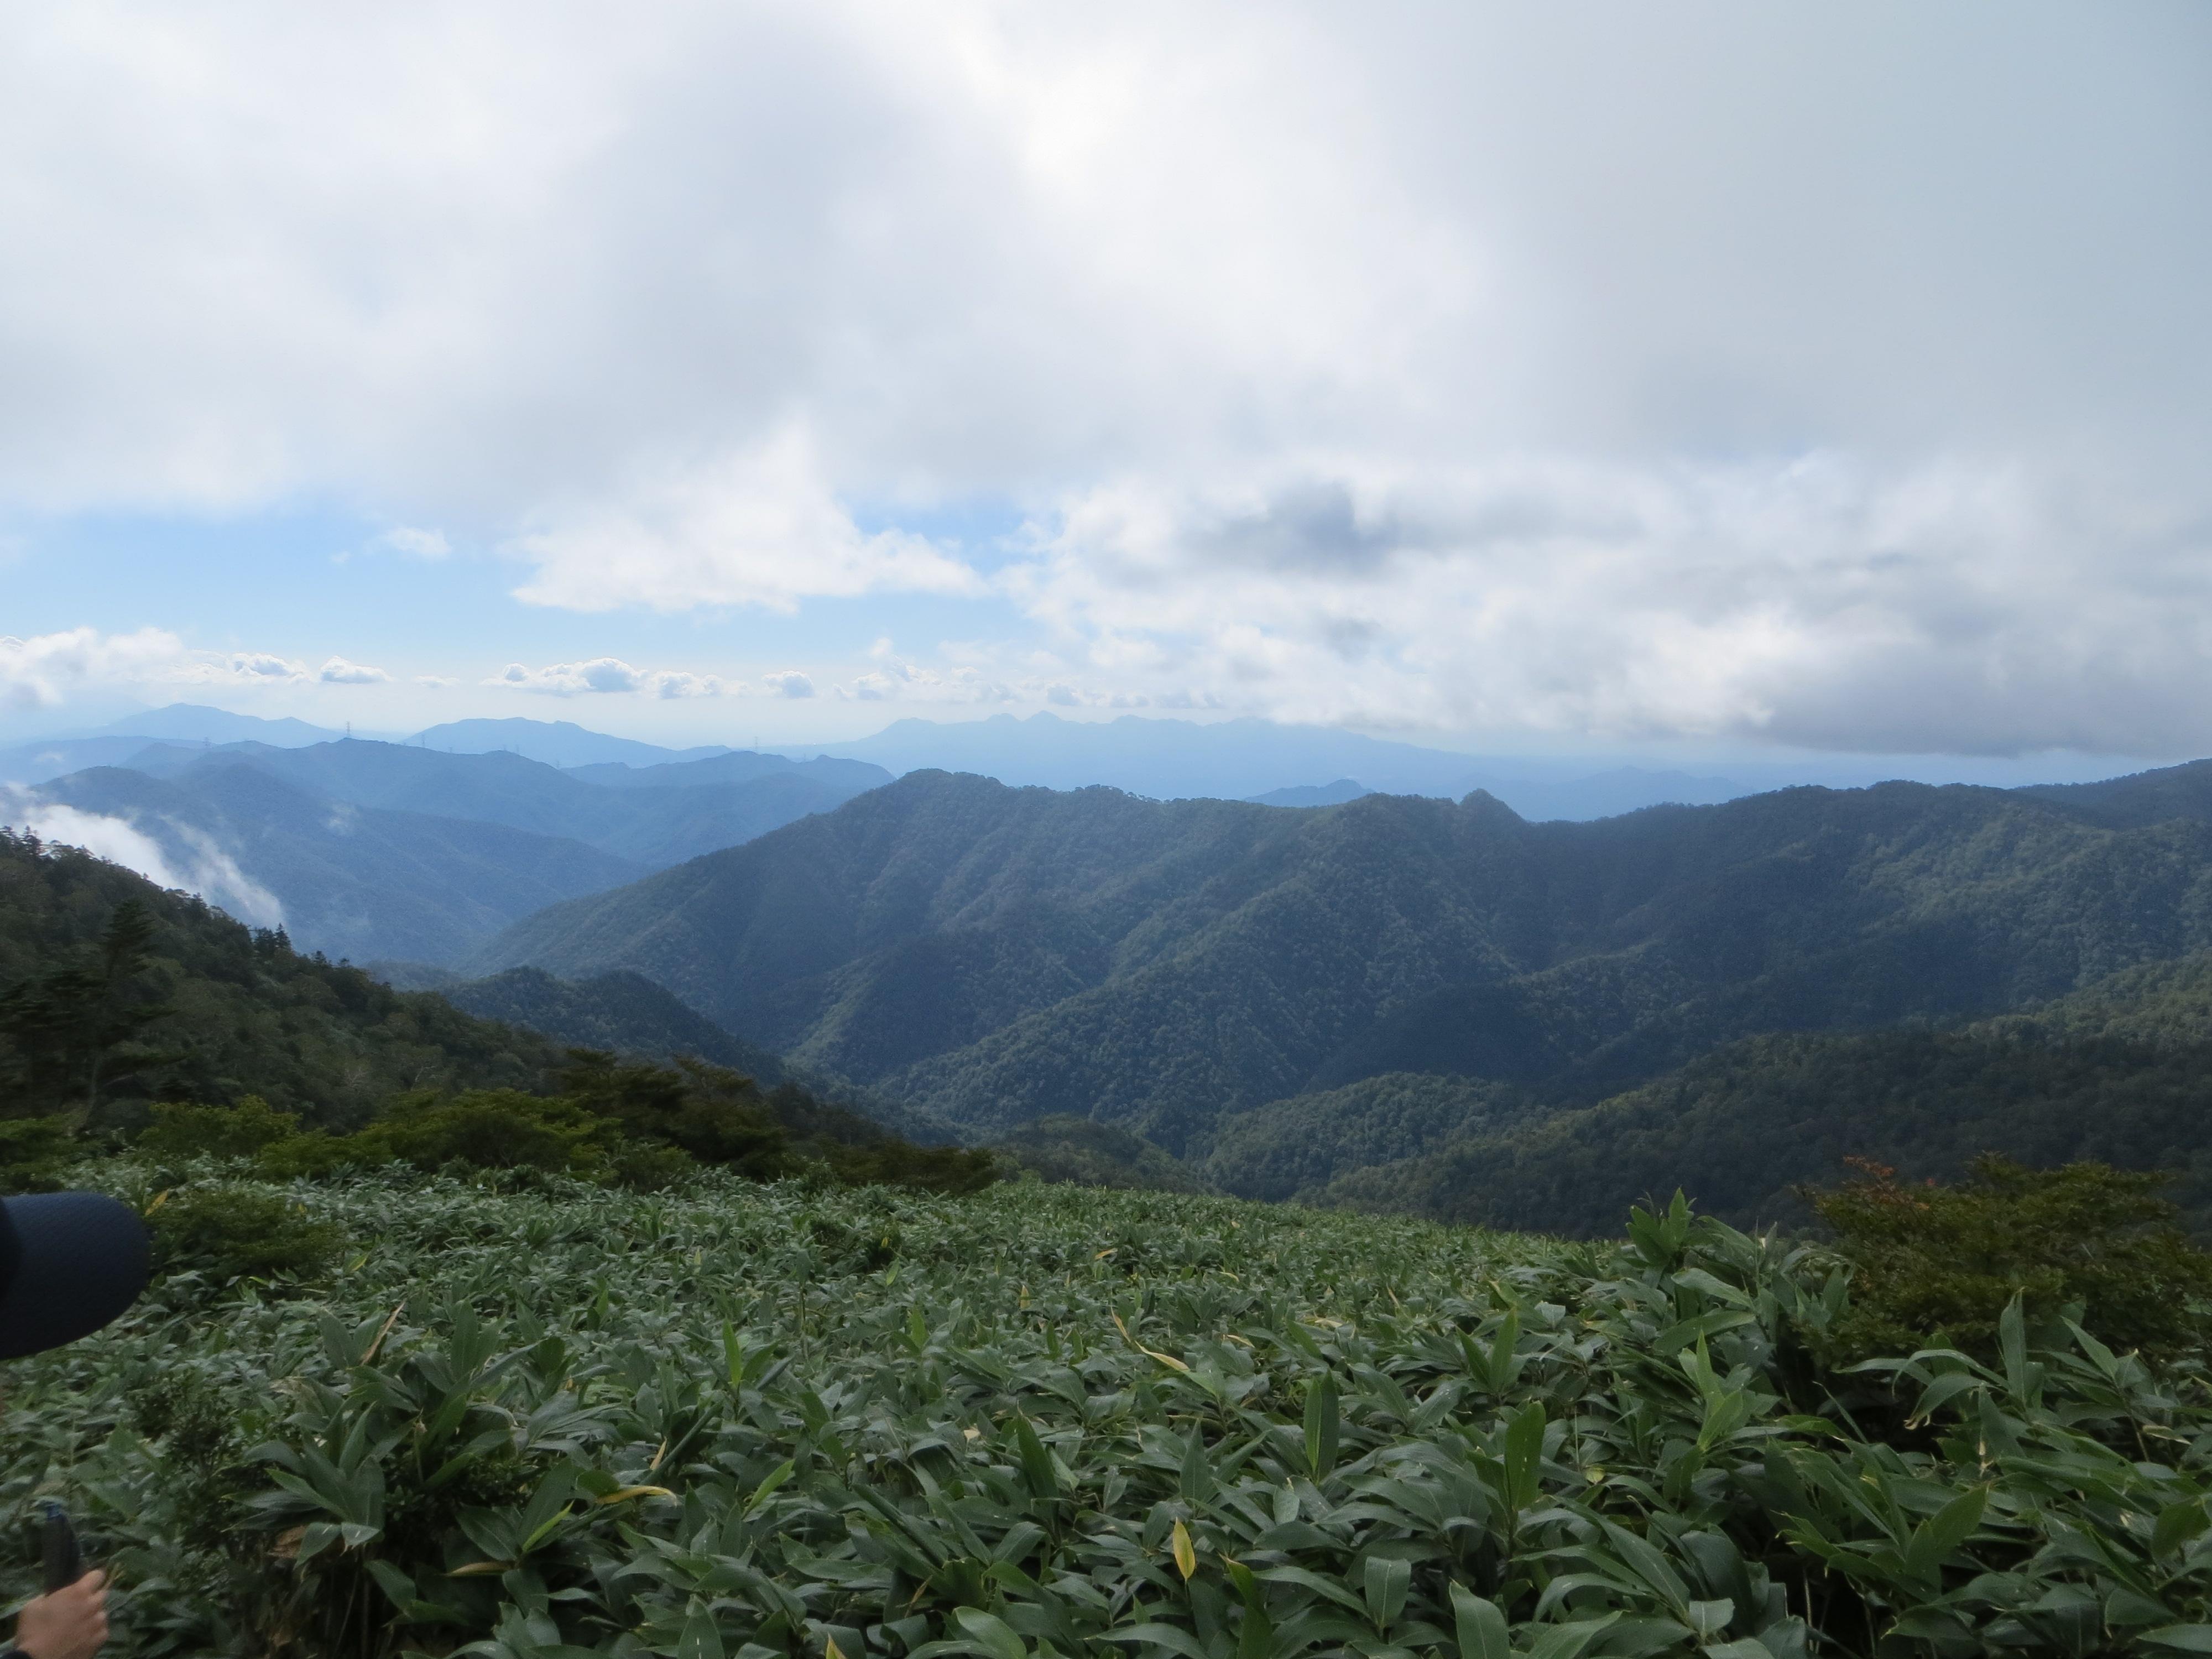 1563mの峰の手前から中之条町方面を望む